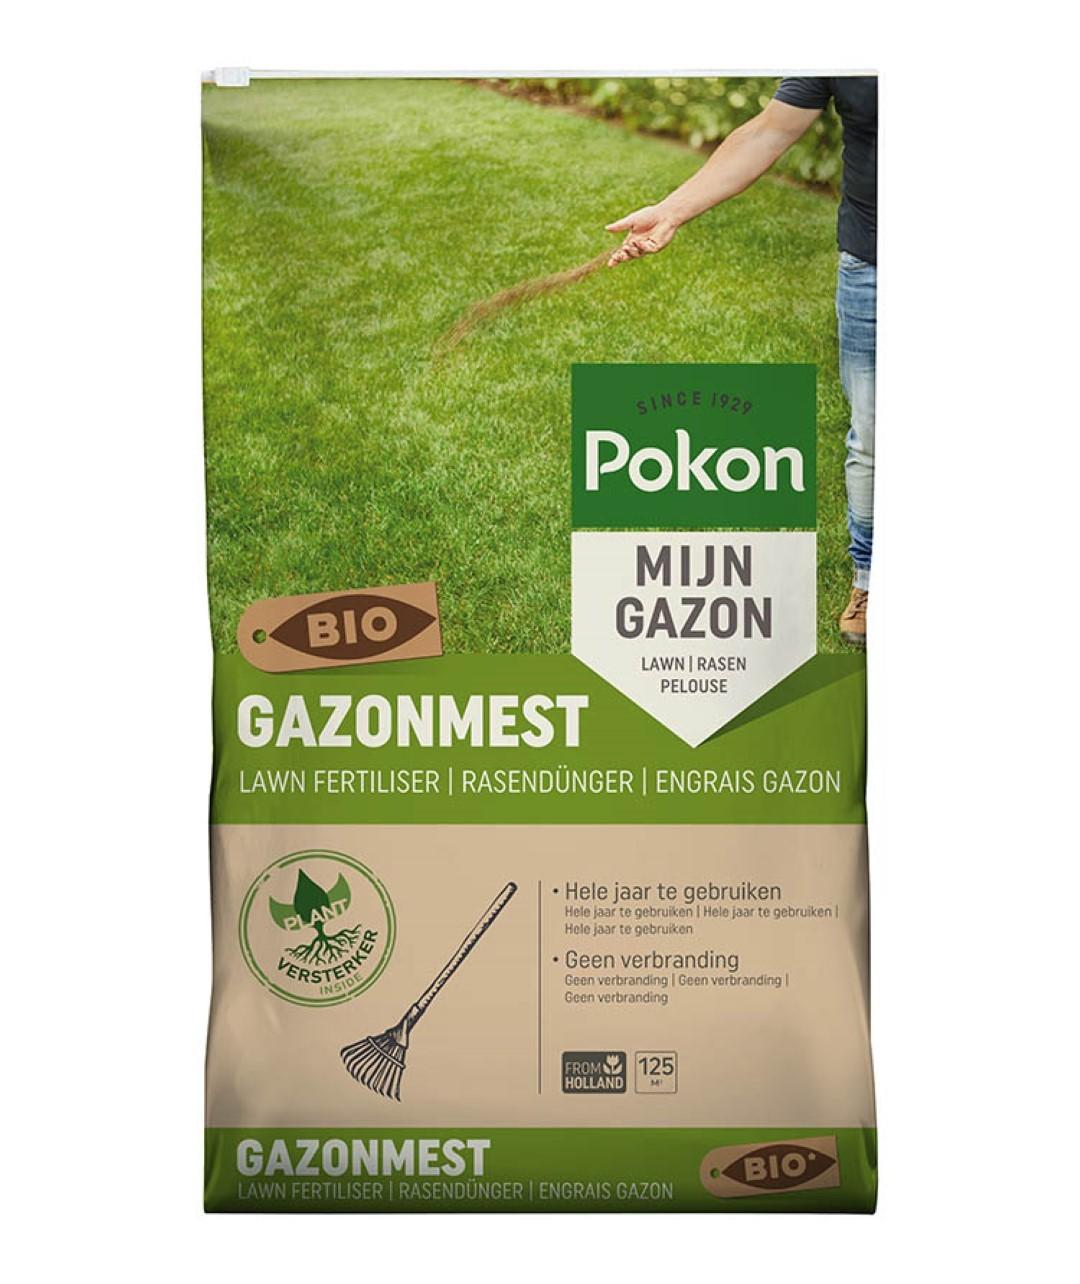 Bio Gazonmest 125m2